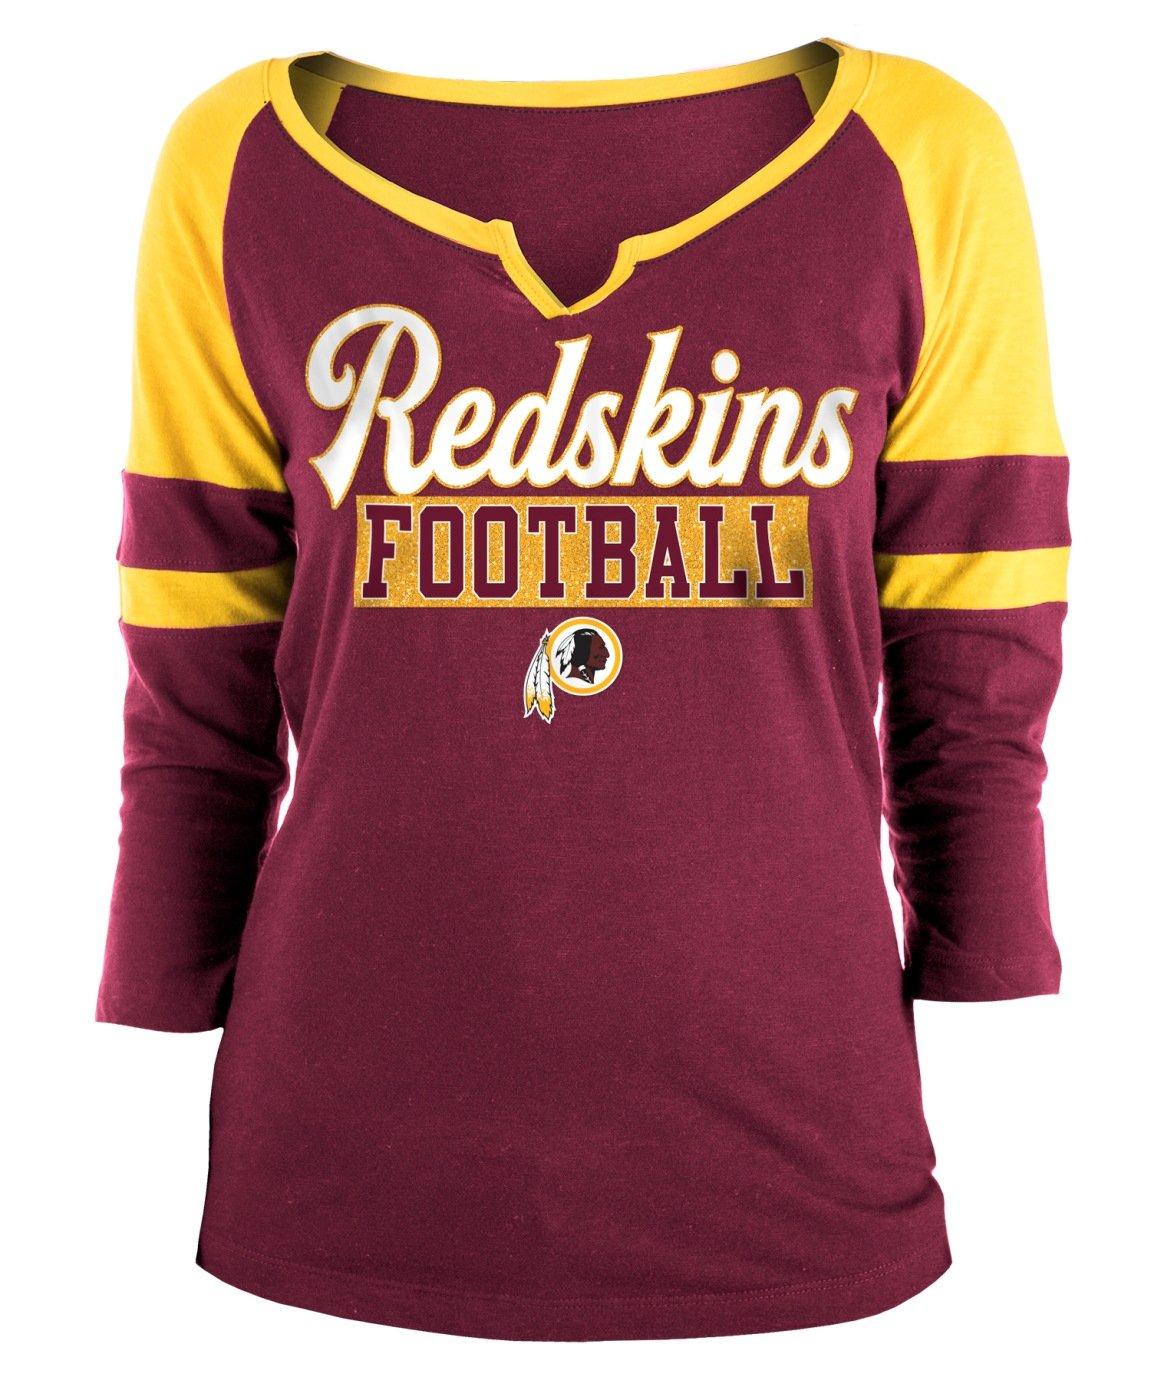 386bd3443 Amazon.com   New Era Washington Redskins Ladies Slub Jersey 3 4 Sleeve  Raglan Split Scoop T-Shirt   Sports   Outdoors